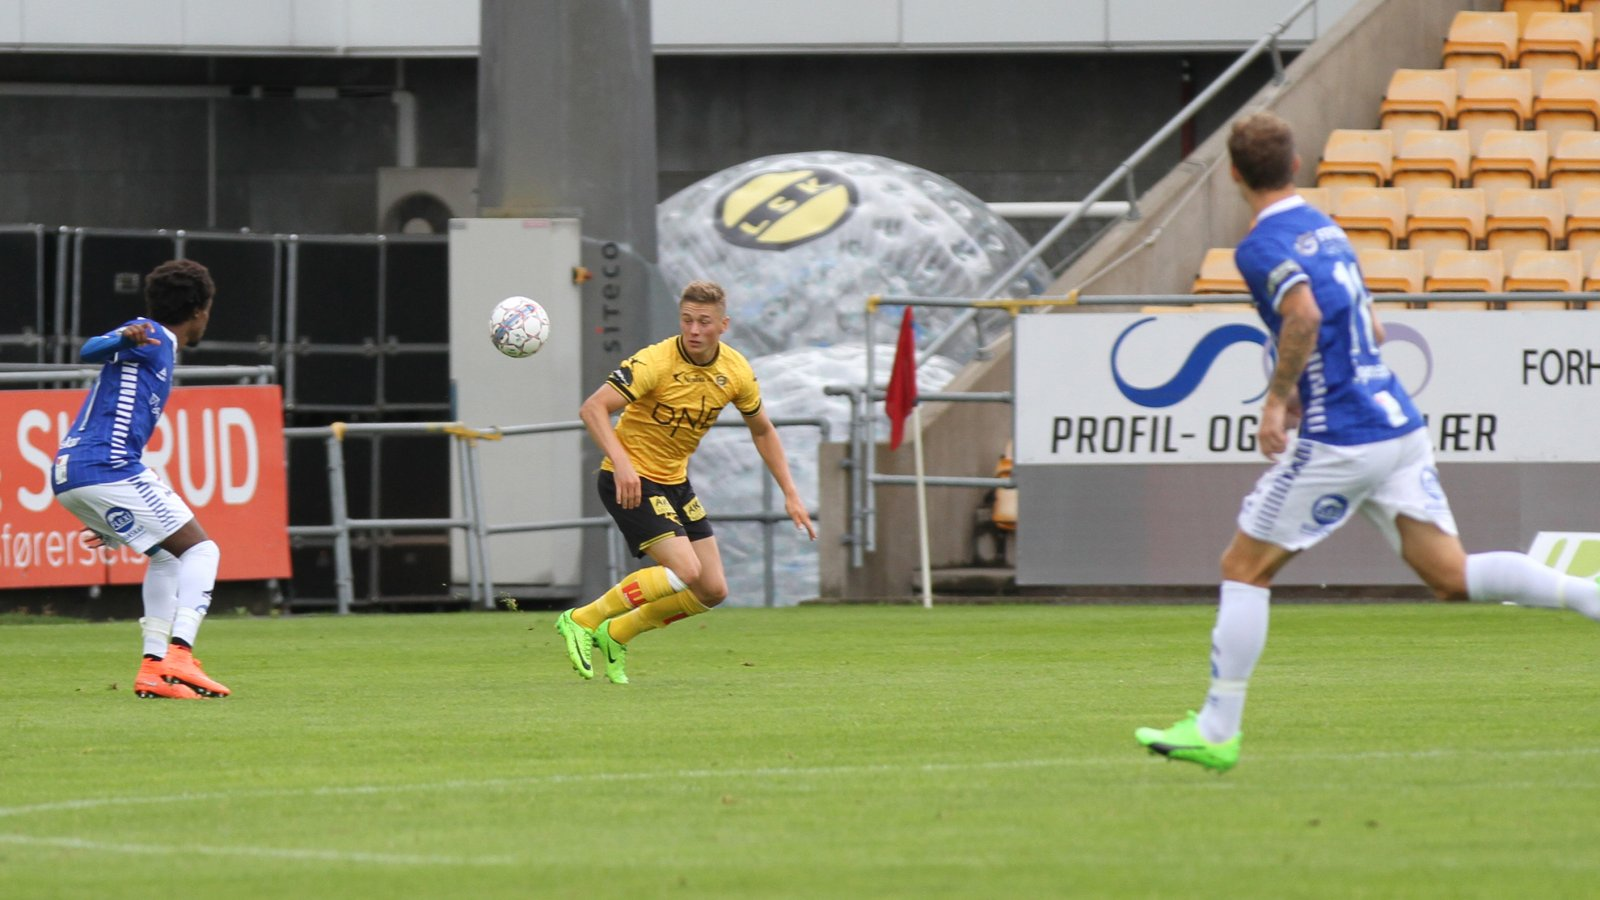 Fredrik Krogstad mot Sarpsborg 08